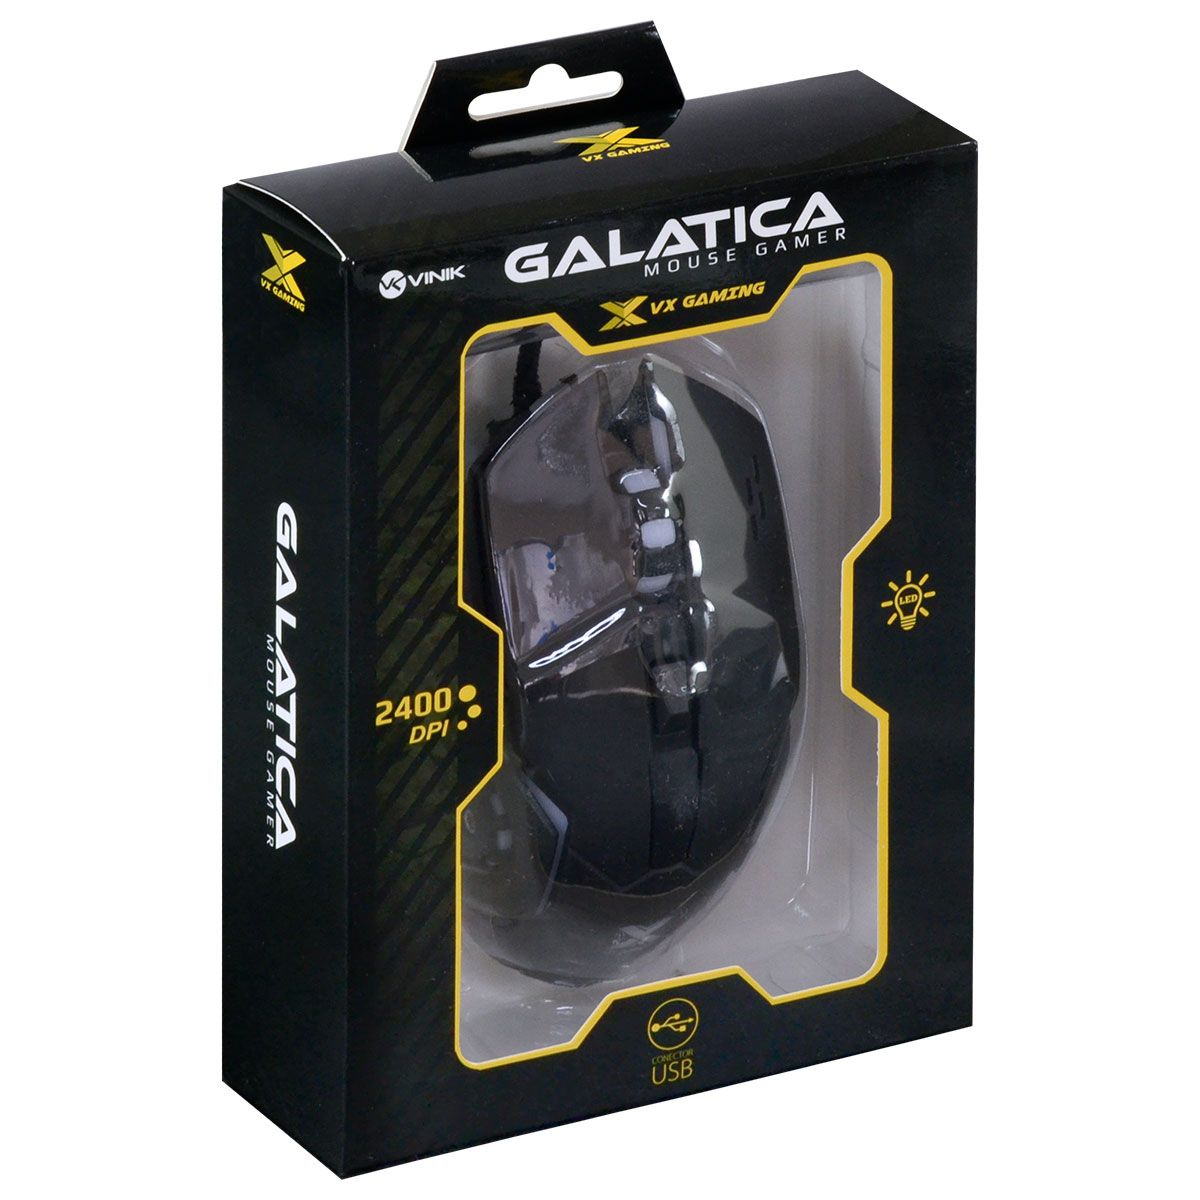 Mouse Gamer VX Gaming Galatica 2400 DPI Led Vermelho Usb Vinik